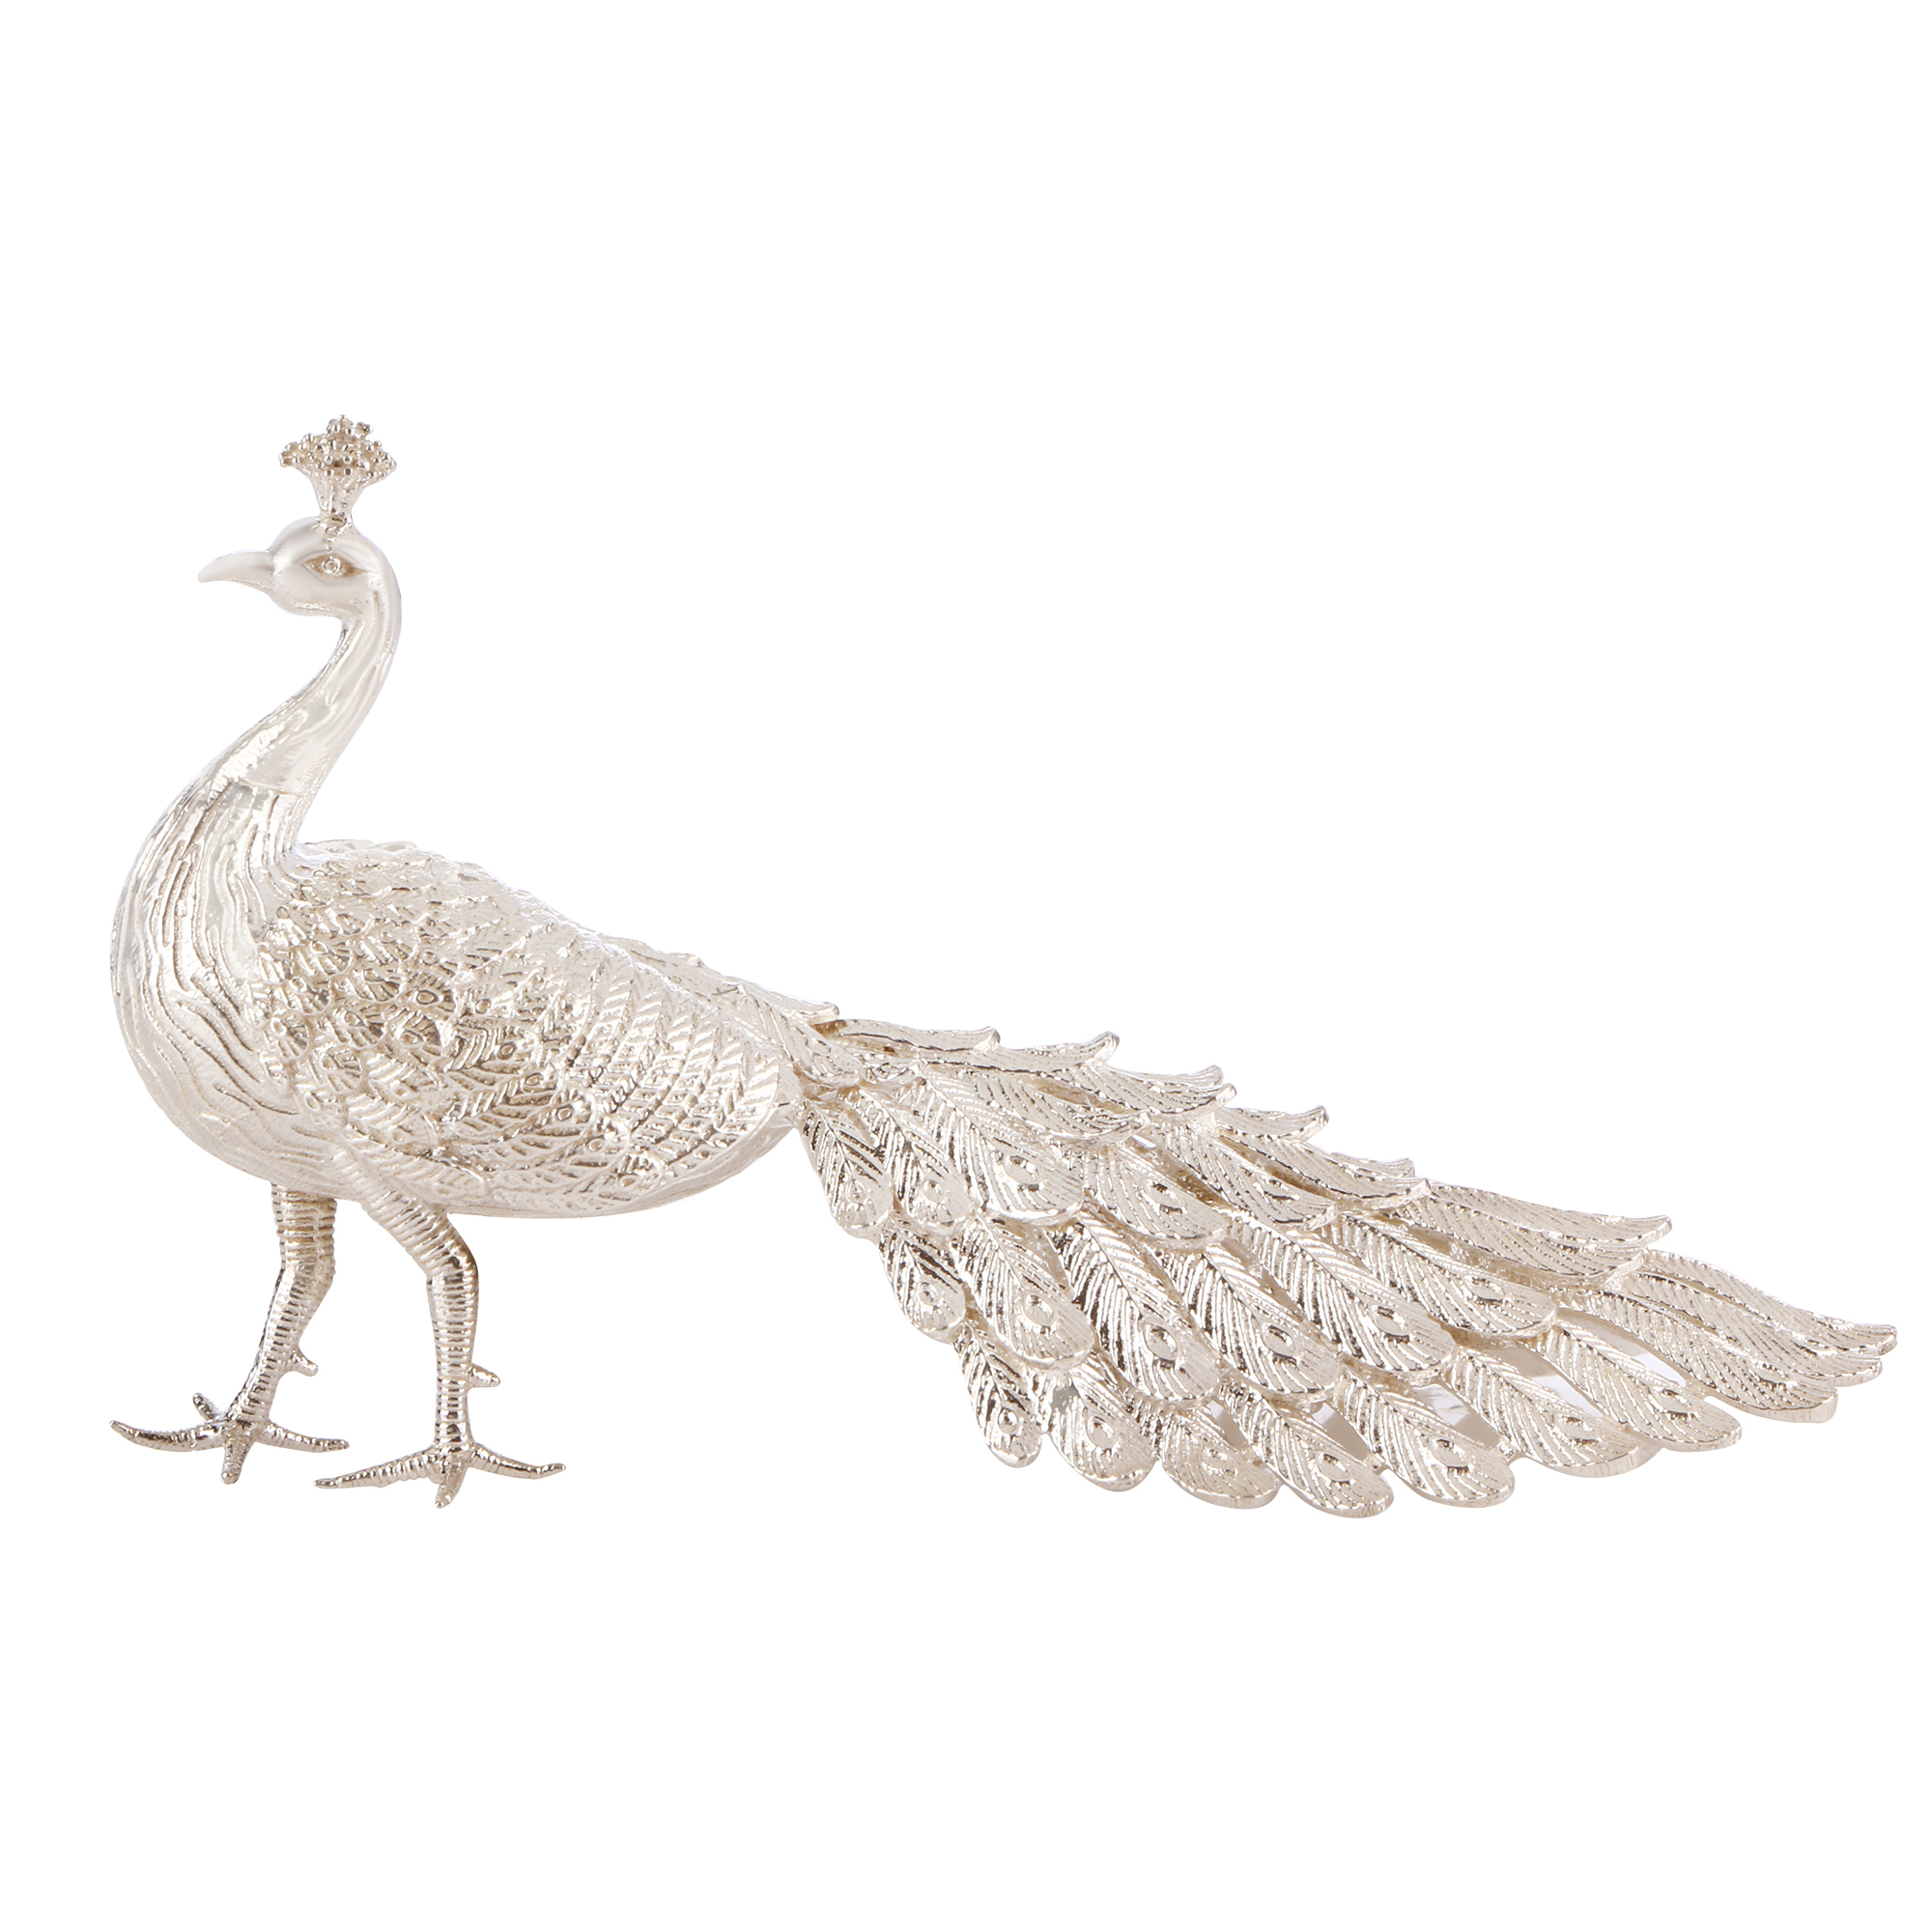 Peacock in Silver by Osasbazaar Main